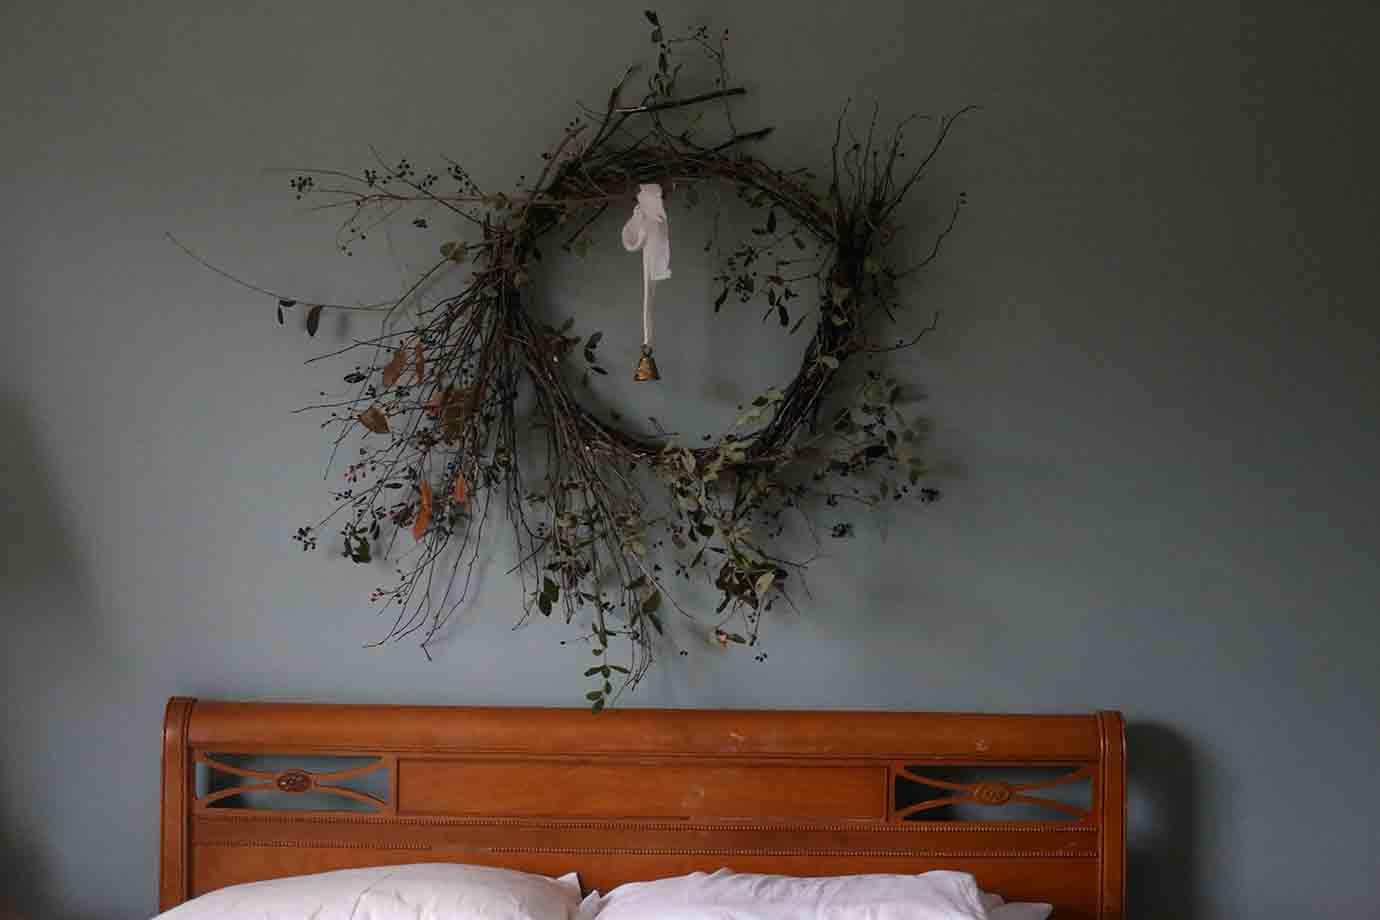 hart-floral-portland-oregon-flowers-80